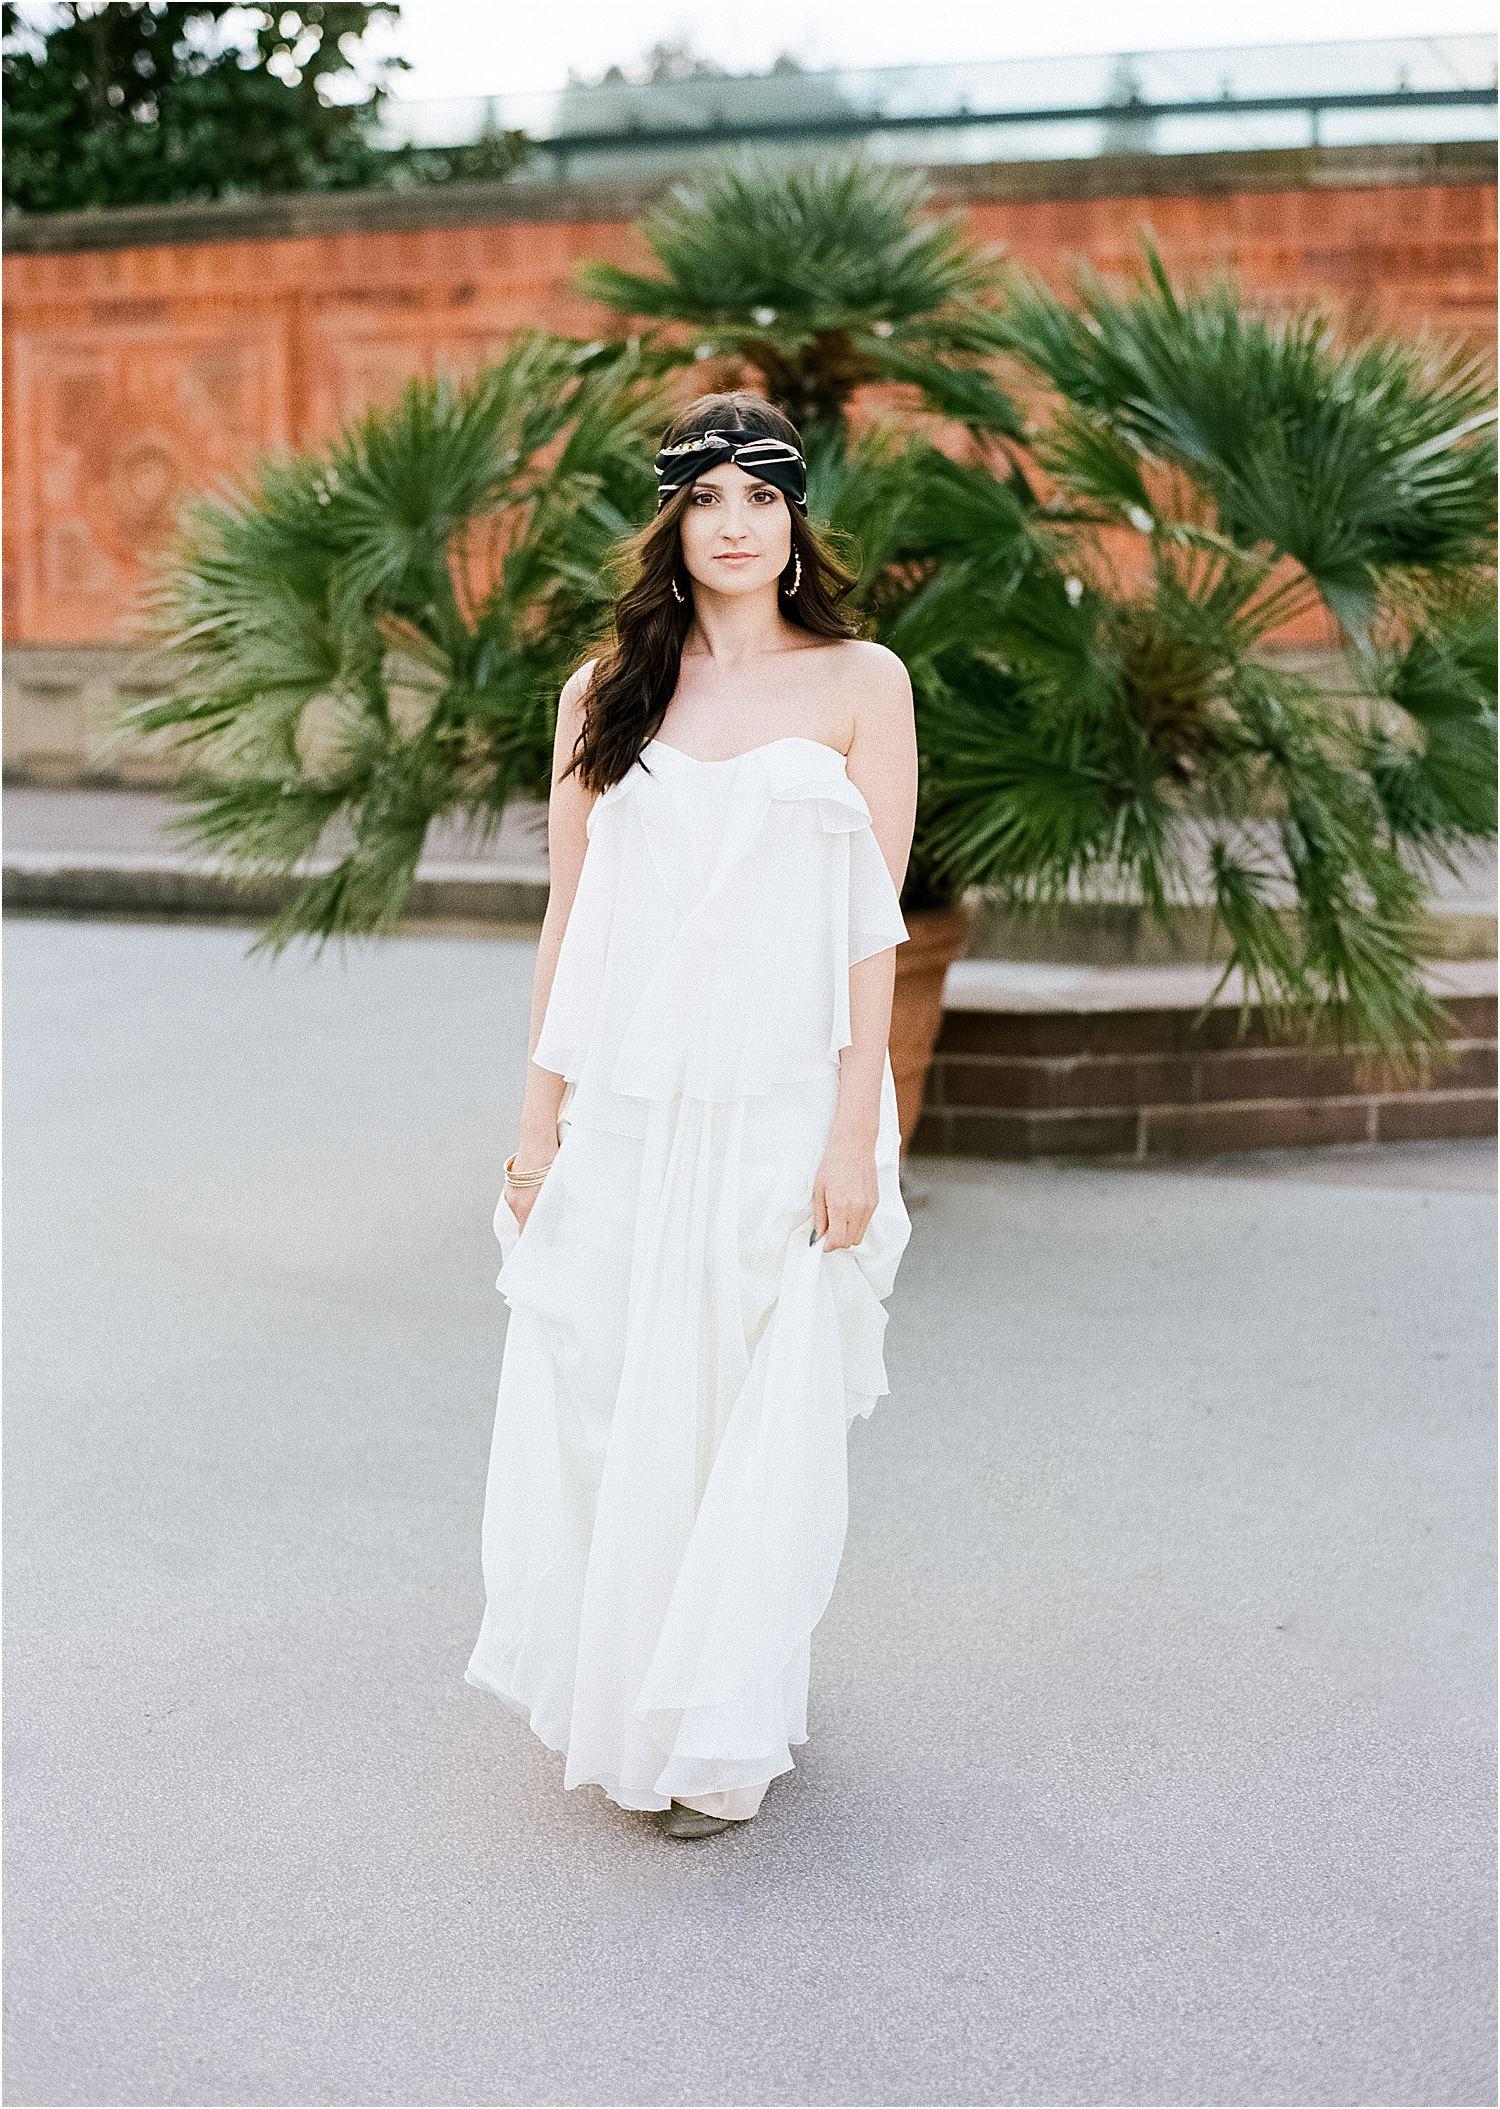 styleshooting-braut2019-neuer-trend-karoline-kirchhof-fotografie (11).jpg